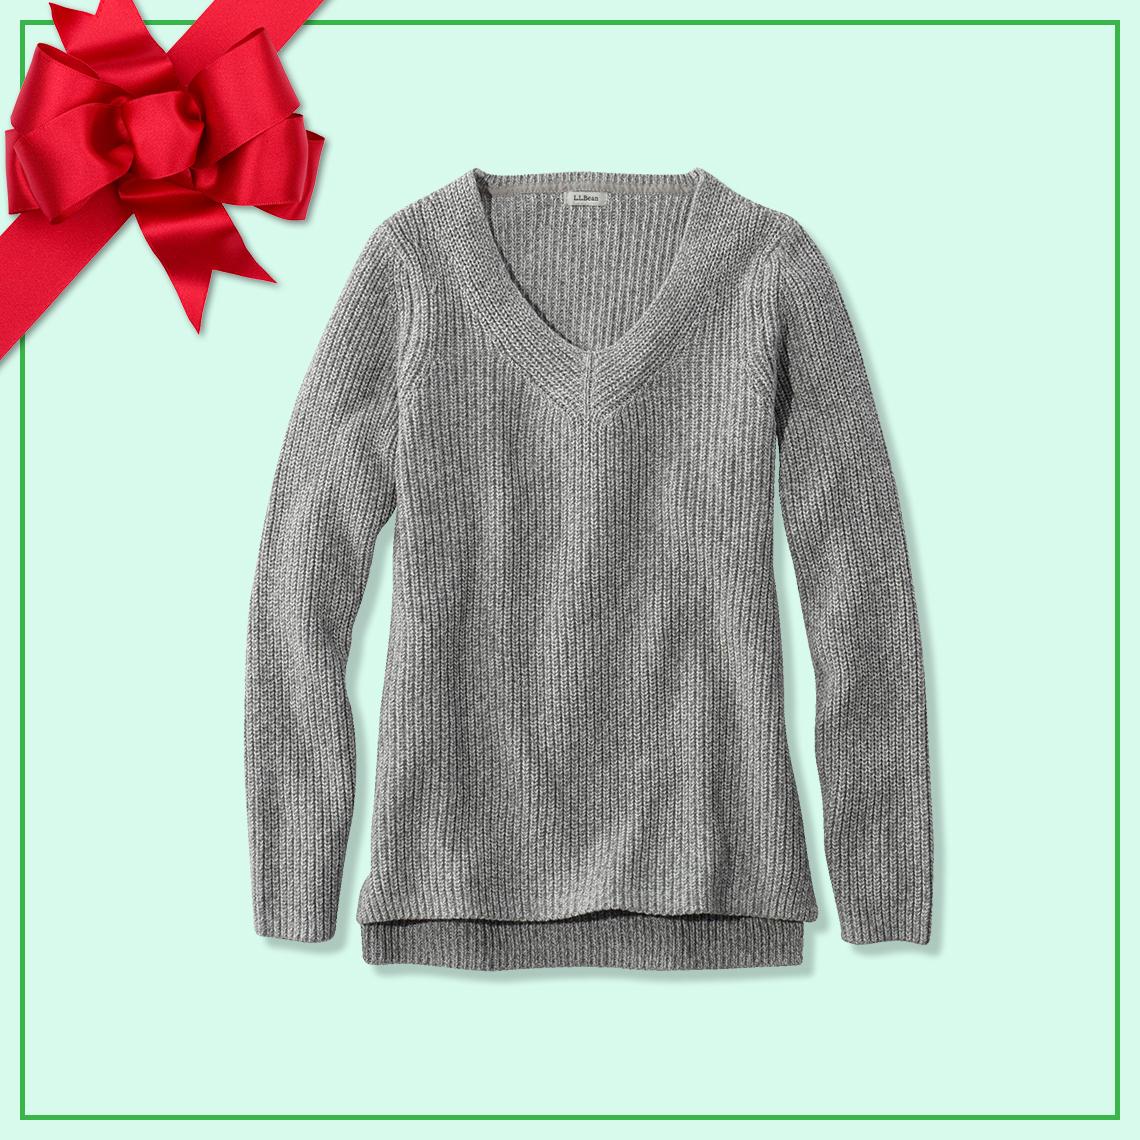 A gray v neck sweater.